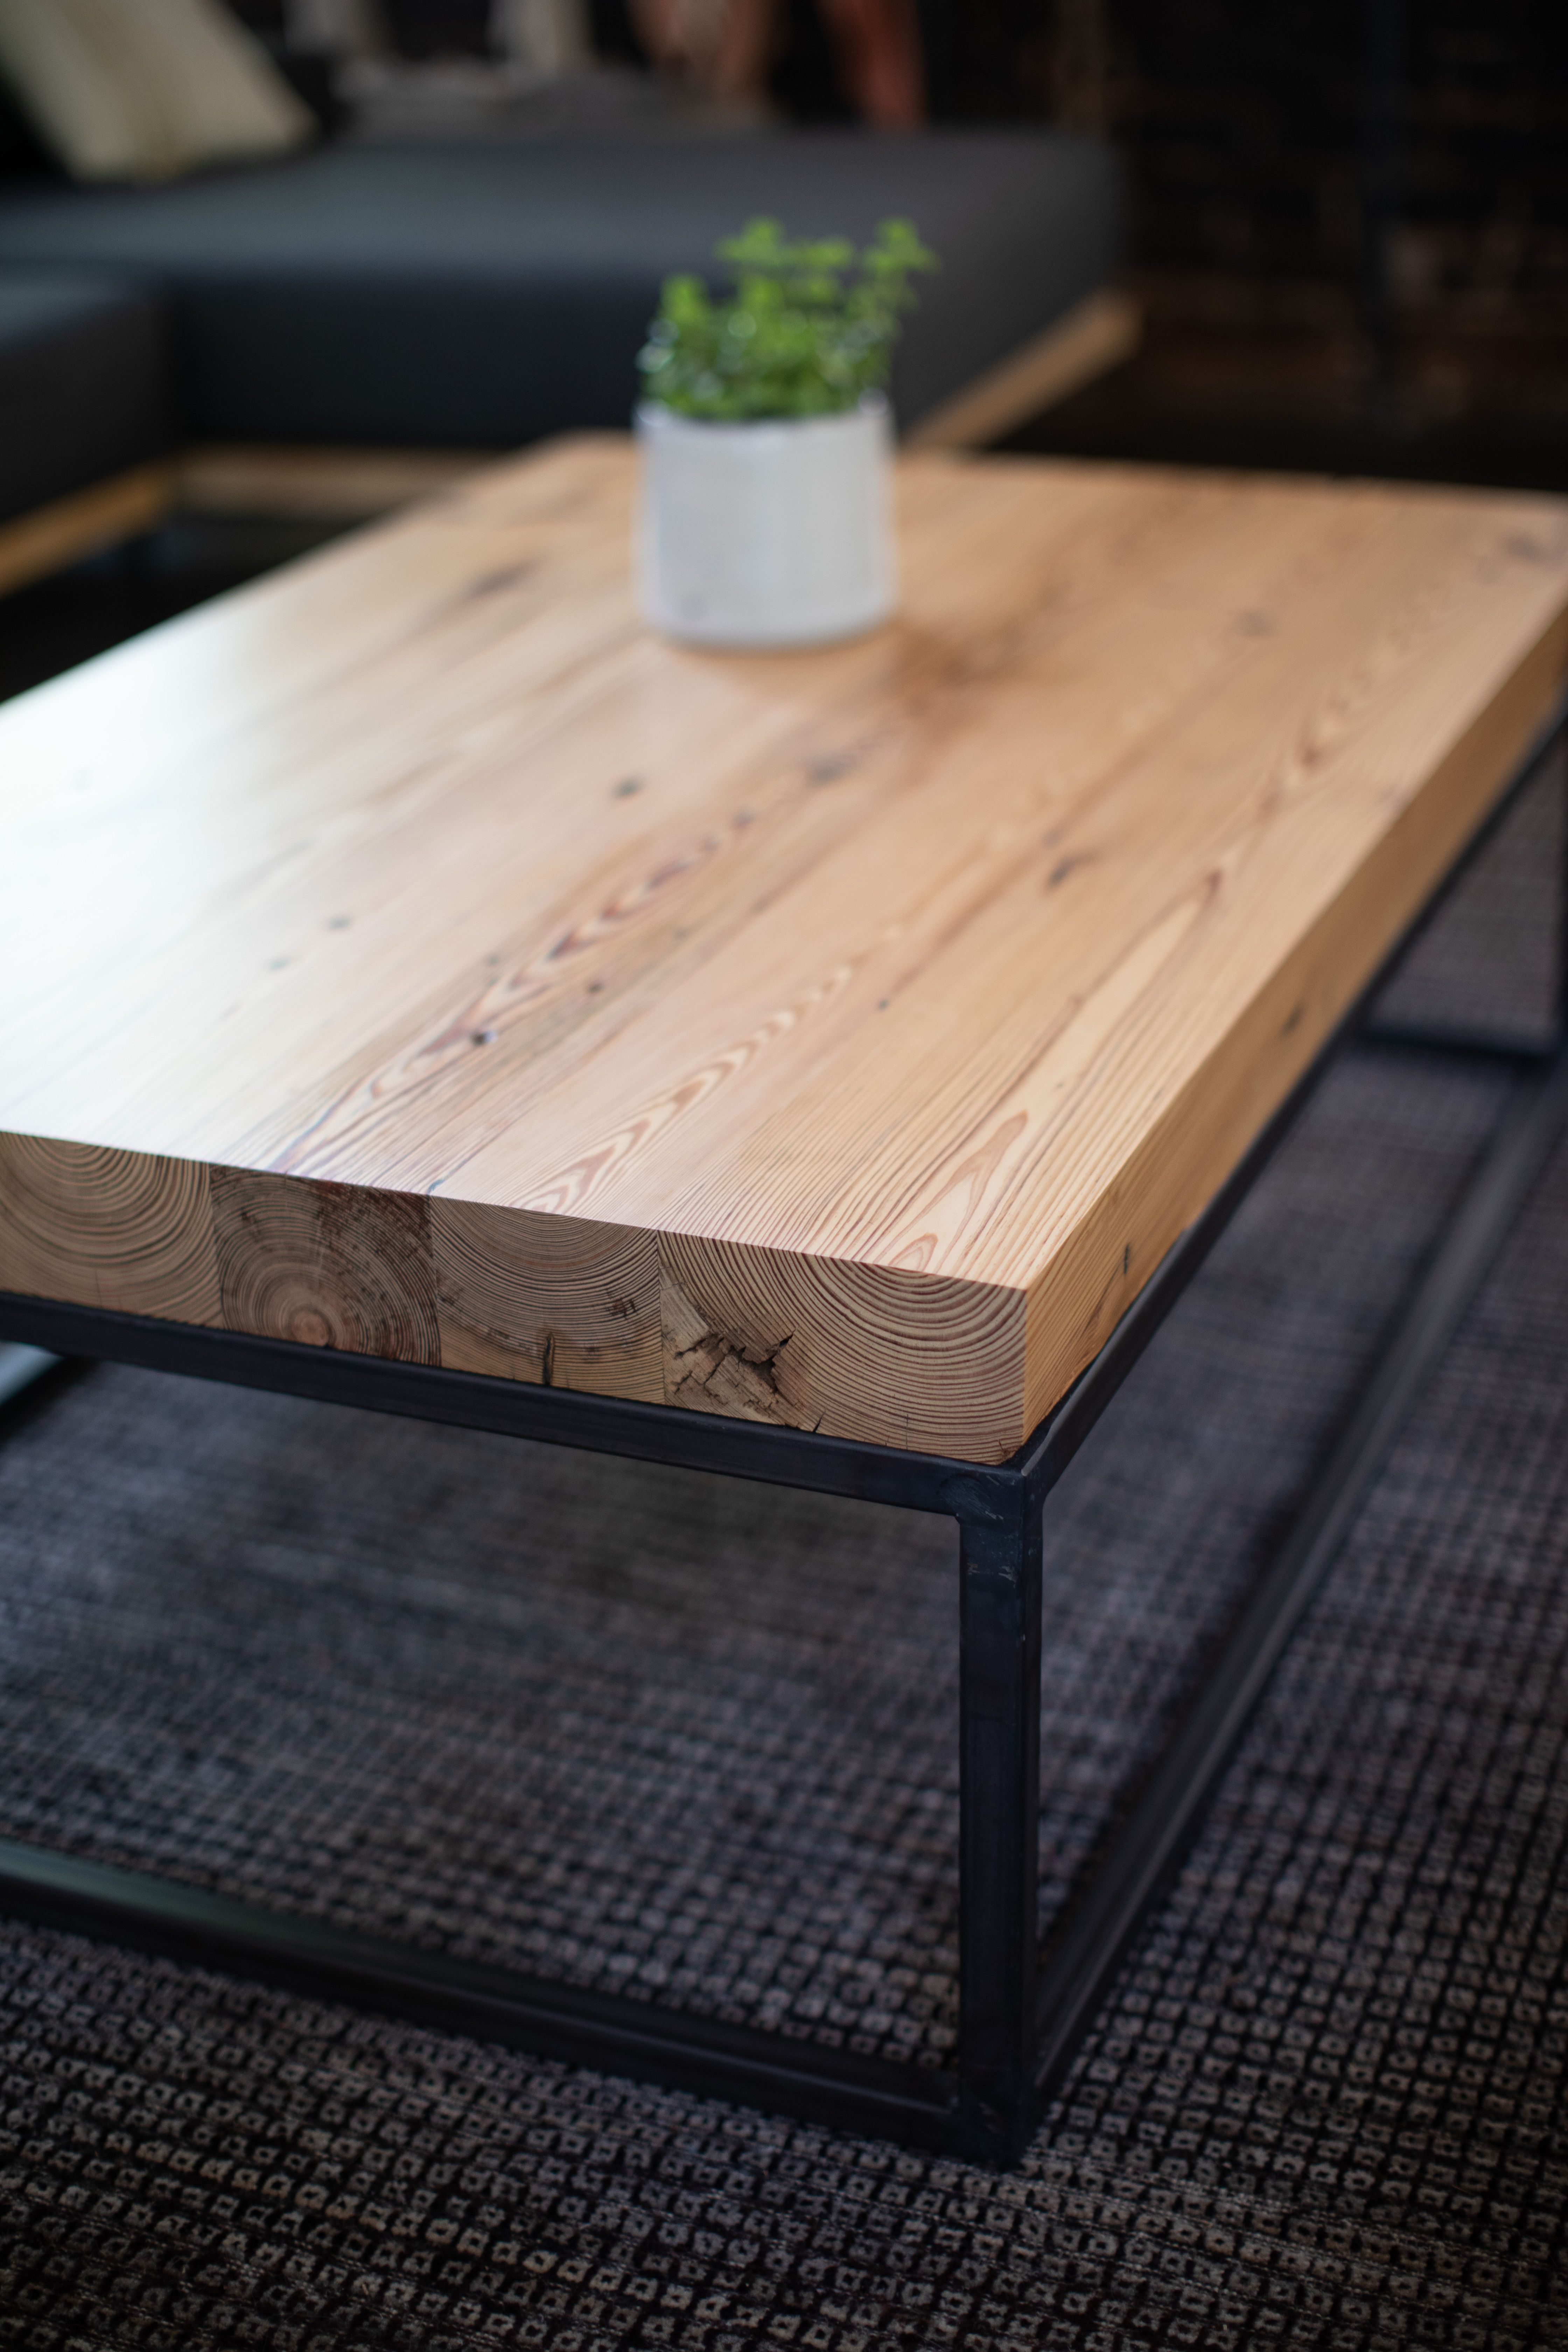 Heart Pine Mill Plank Coffee Table Coffee Table Wood Cool Coffee Tables Coffee Table Design [ 6720 x 4480 Pixel ]